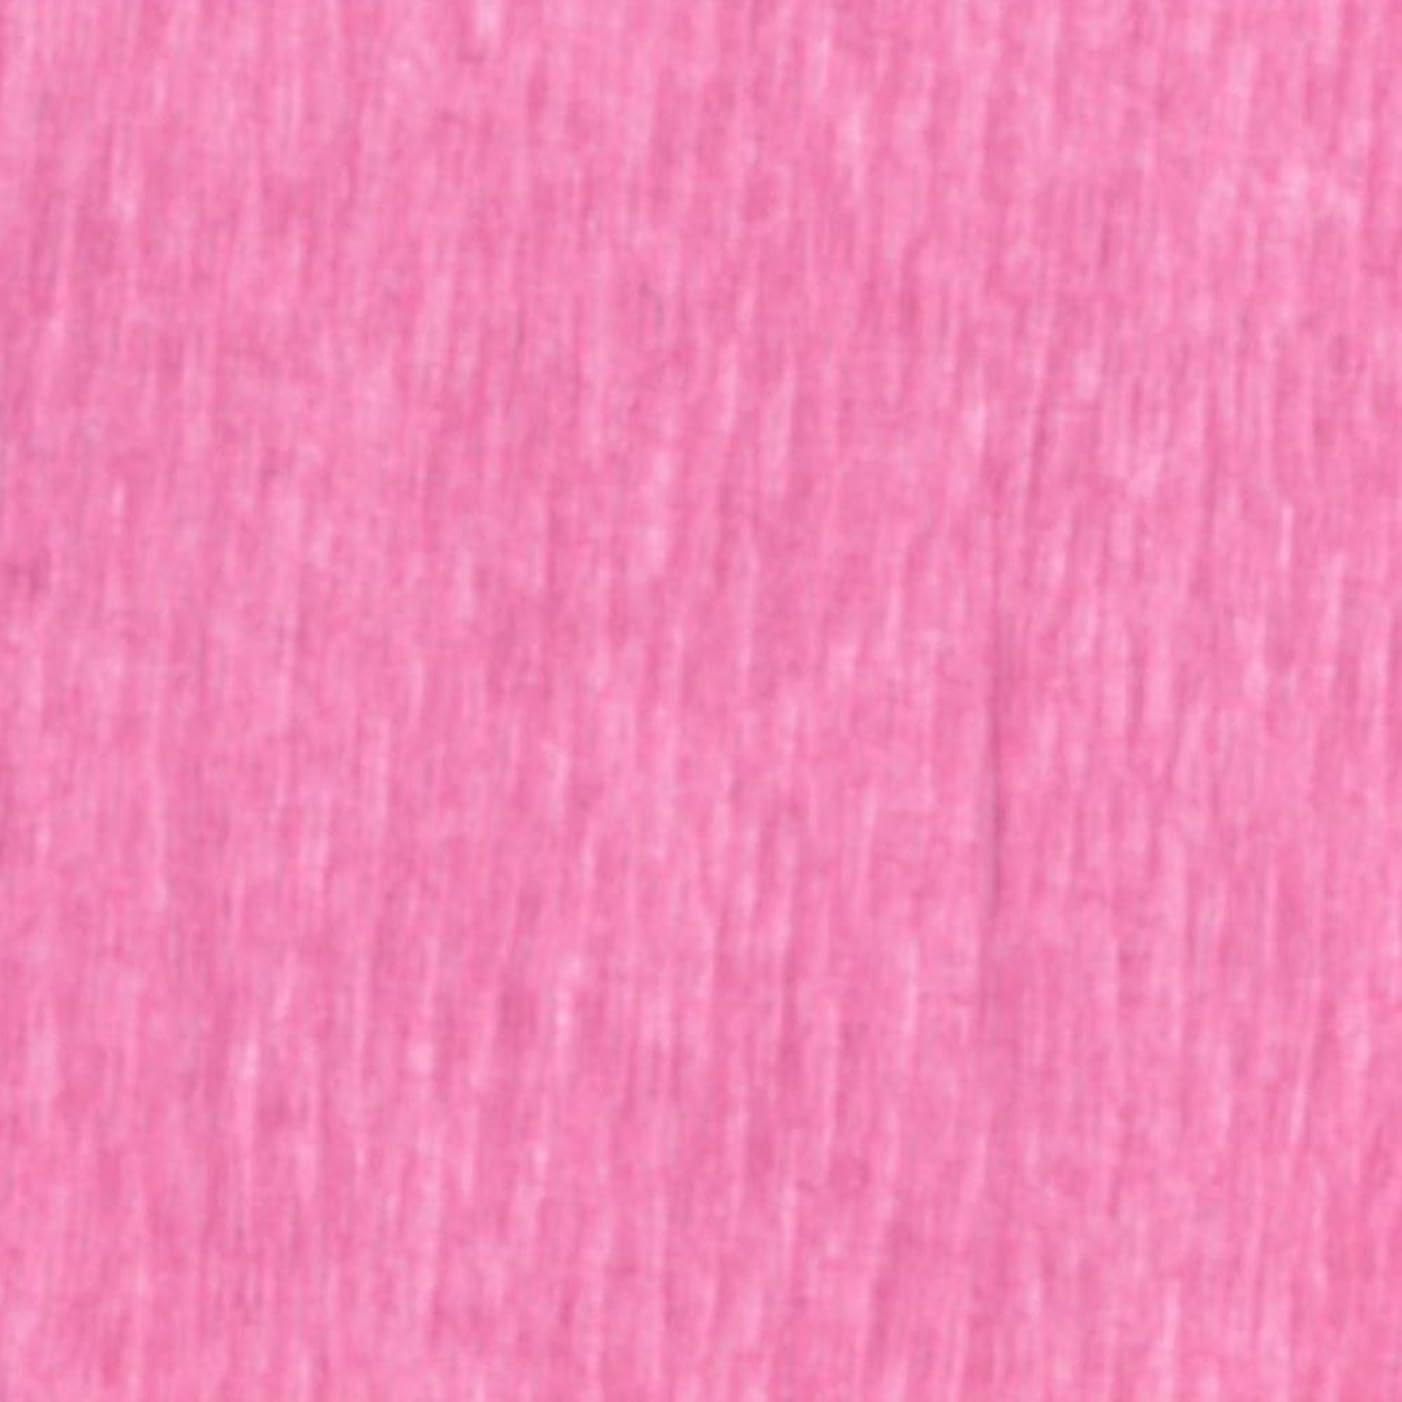 Clairefontaine Non-Bleeding Crepe Paper, 32 g, 2.5 x 0.50 m, Cherry